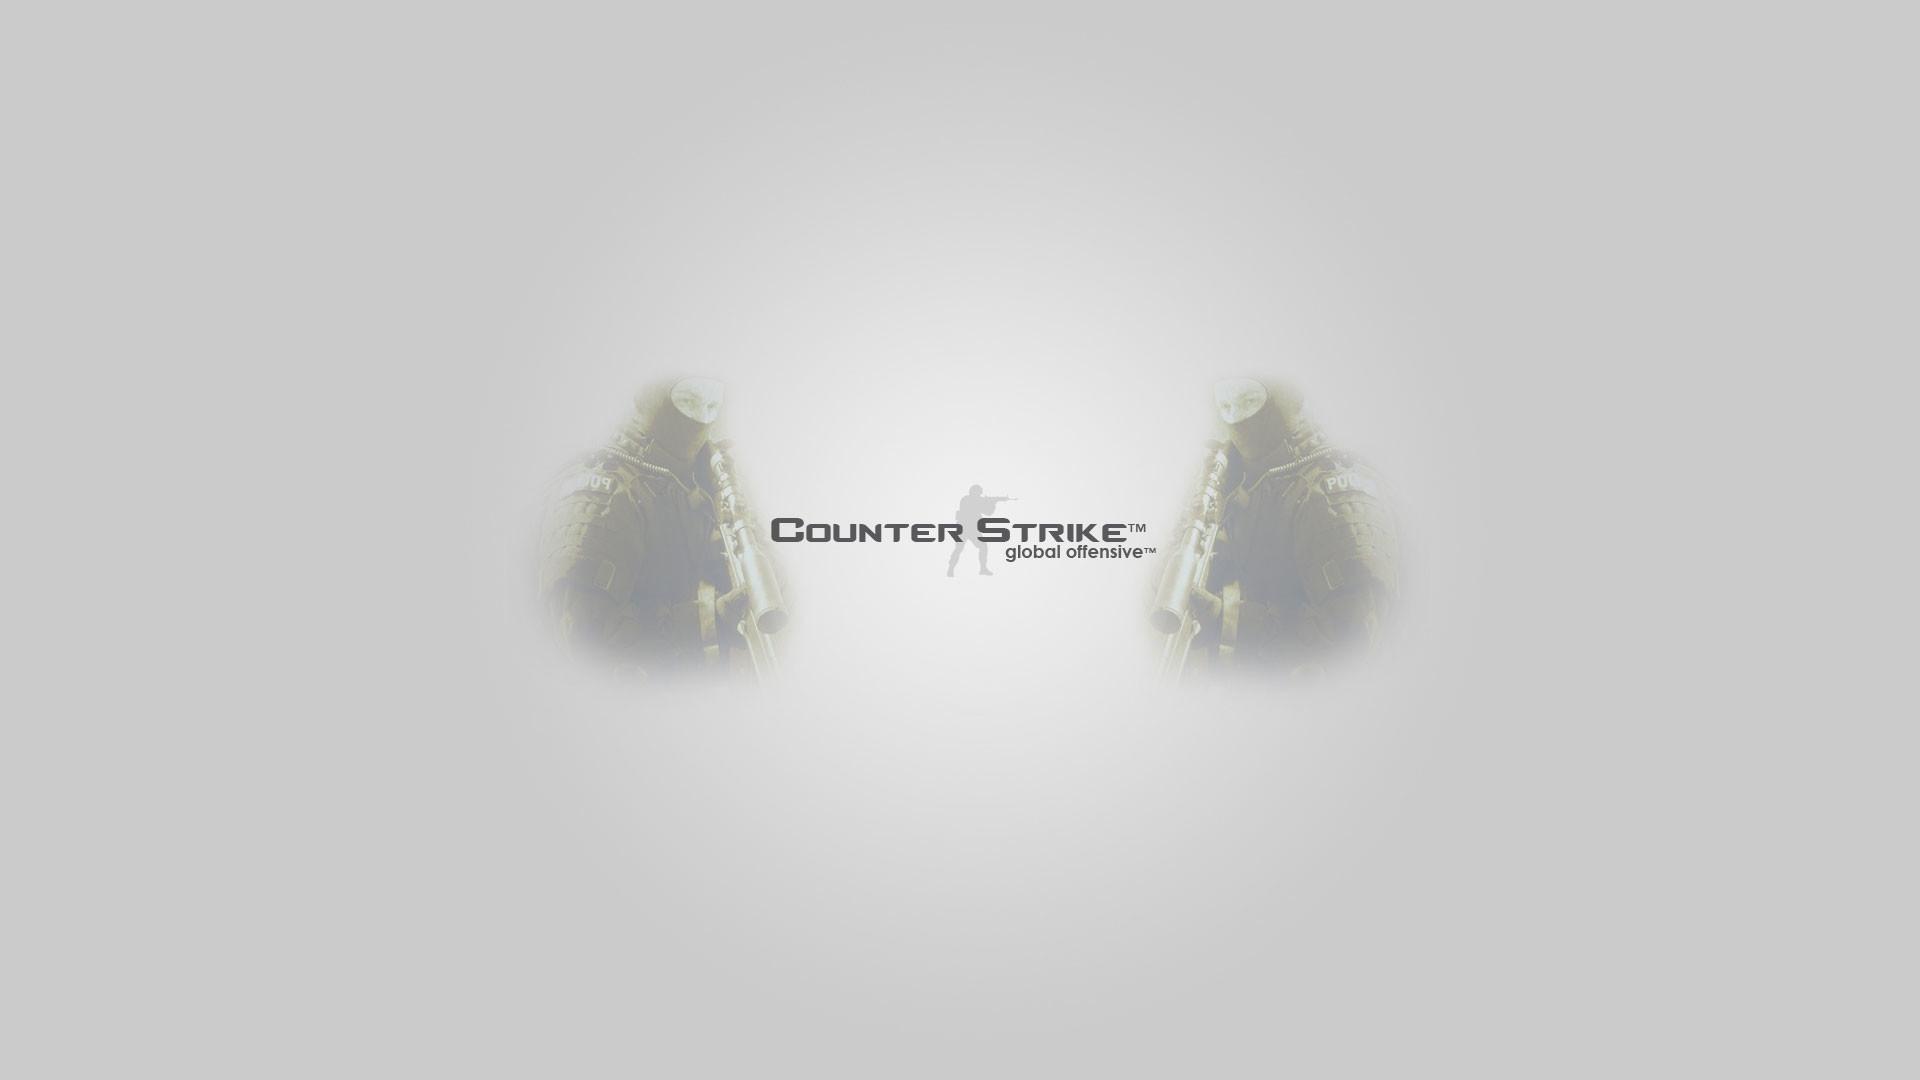 CS:GO – Counter-Strike: Global-Offensive Wallpaper / Hintergrundbild .